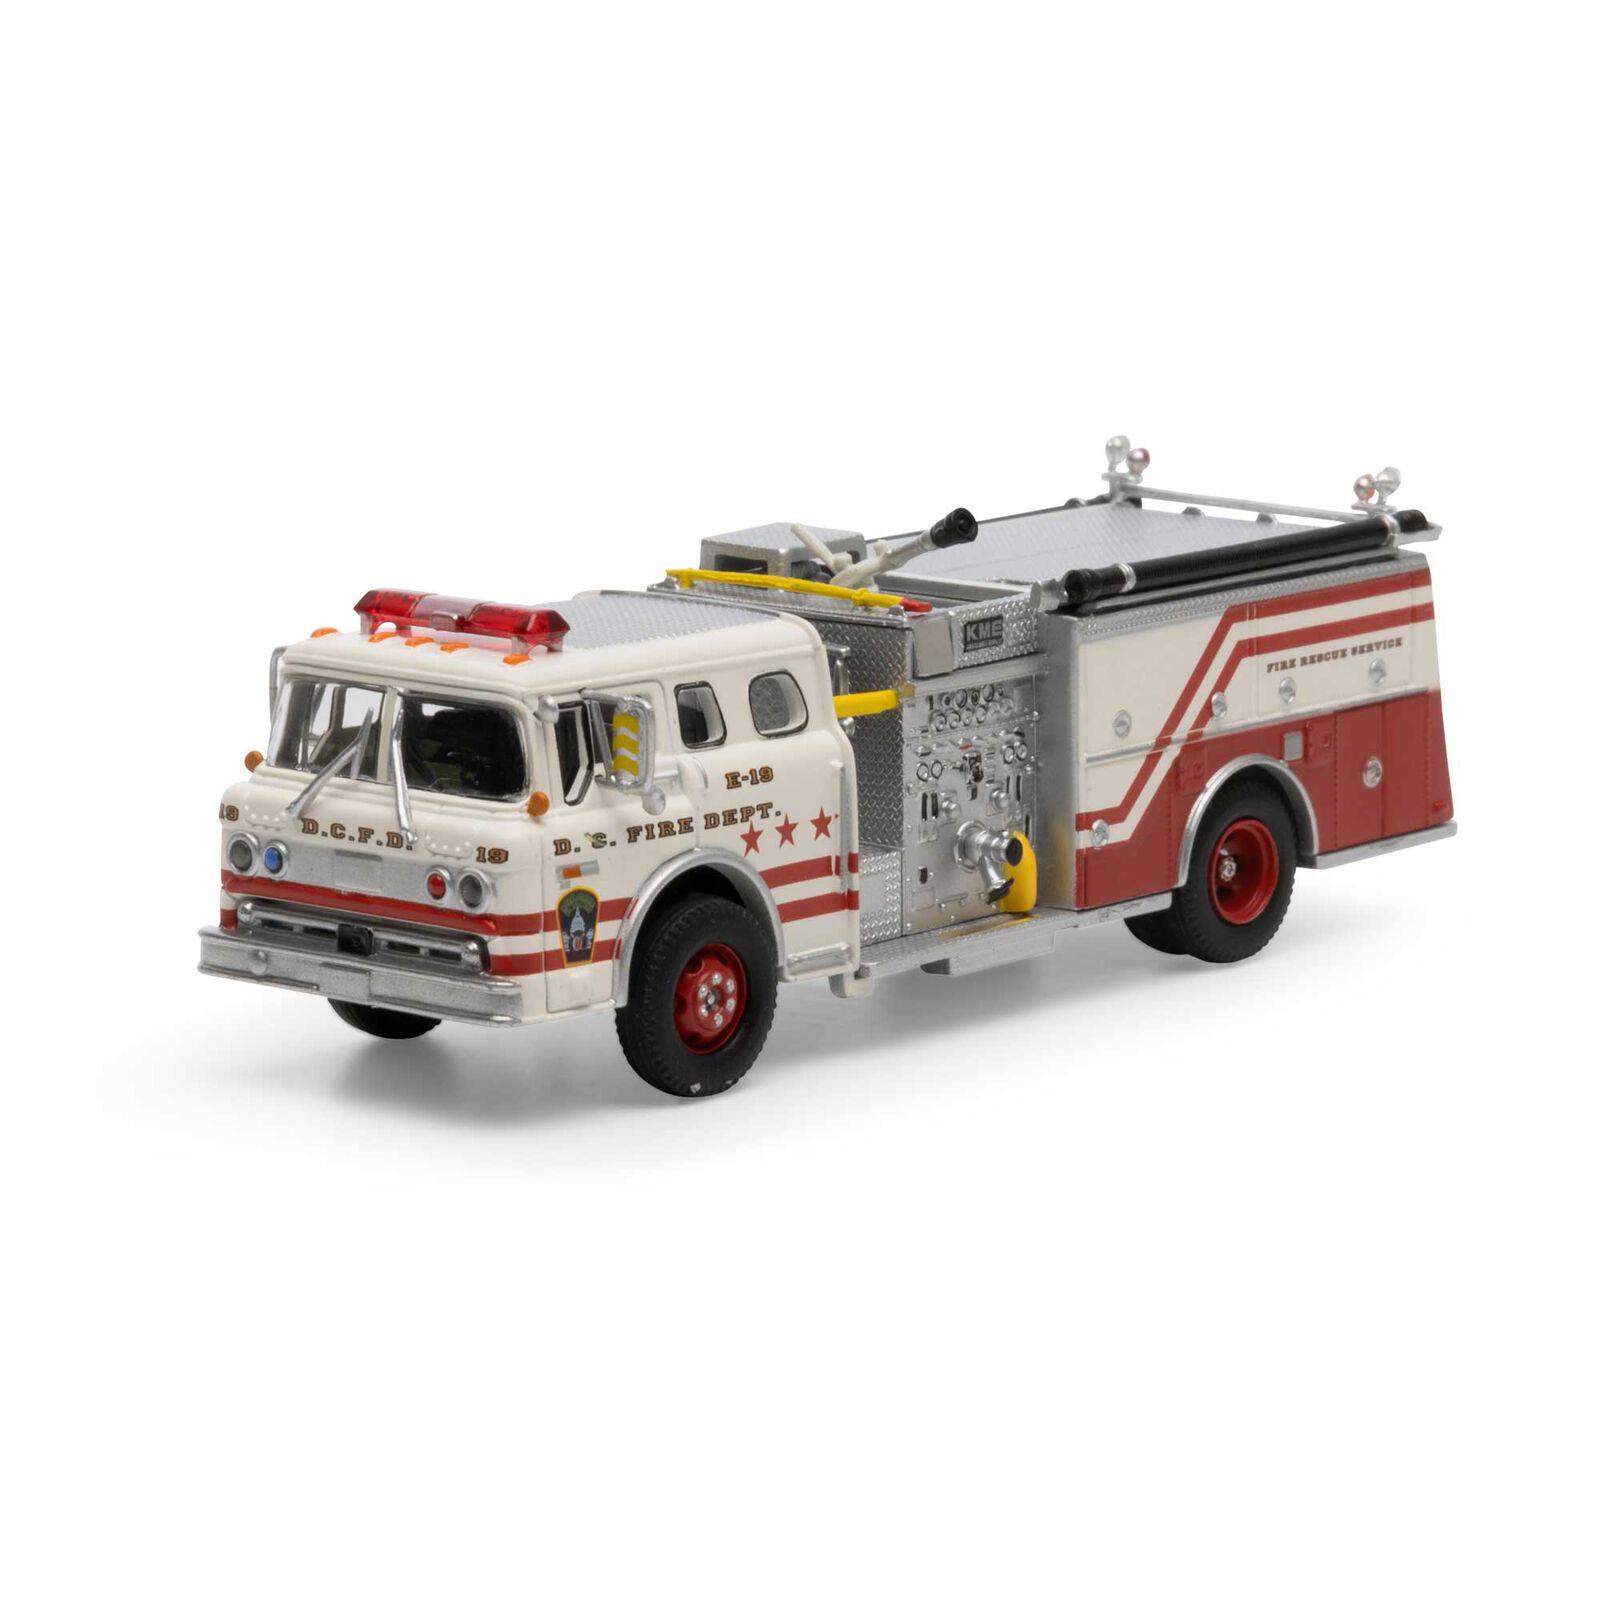 HO RTR Ford C Fire Truck, Washington DC #E-19